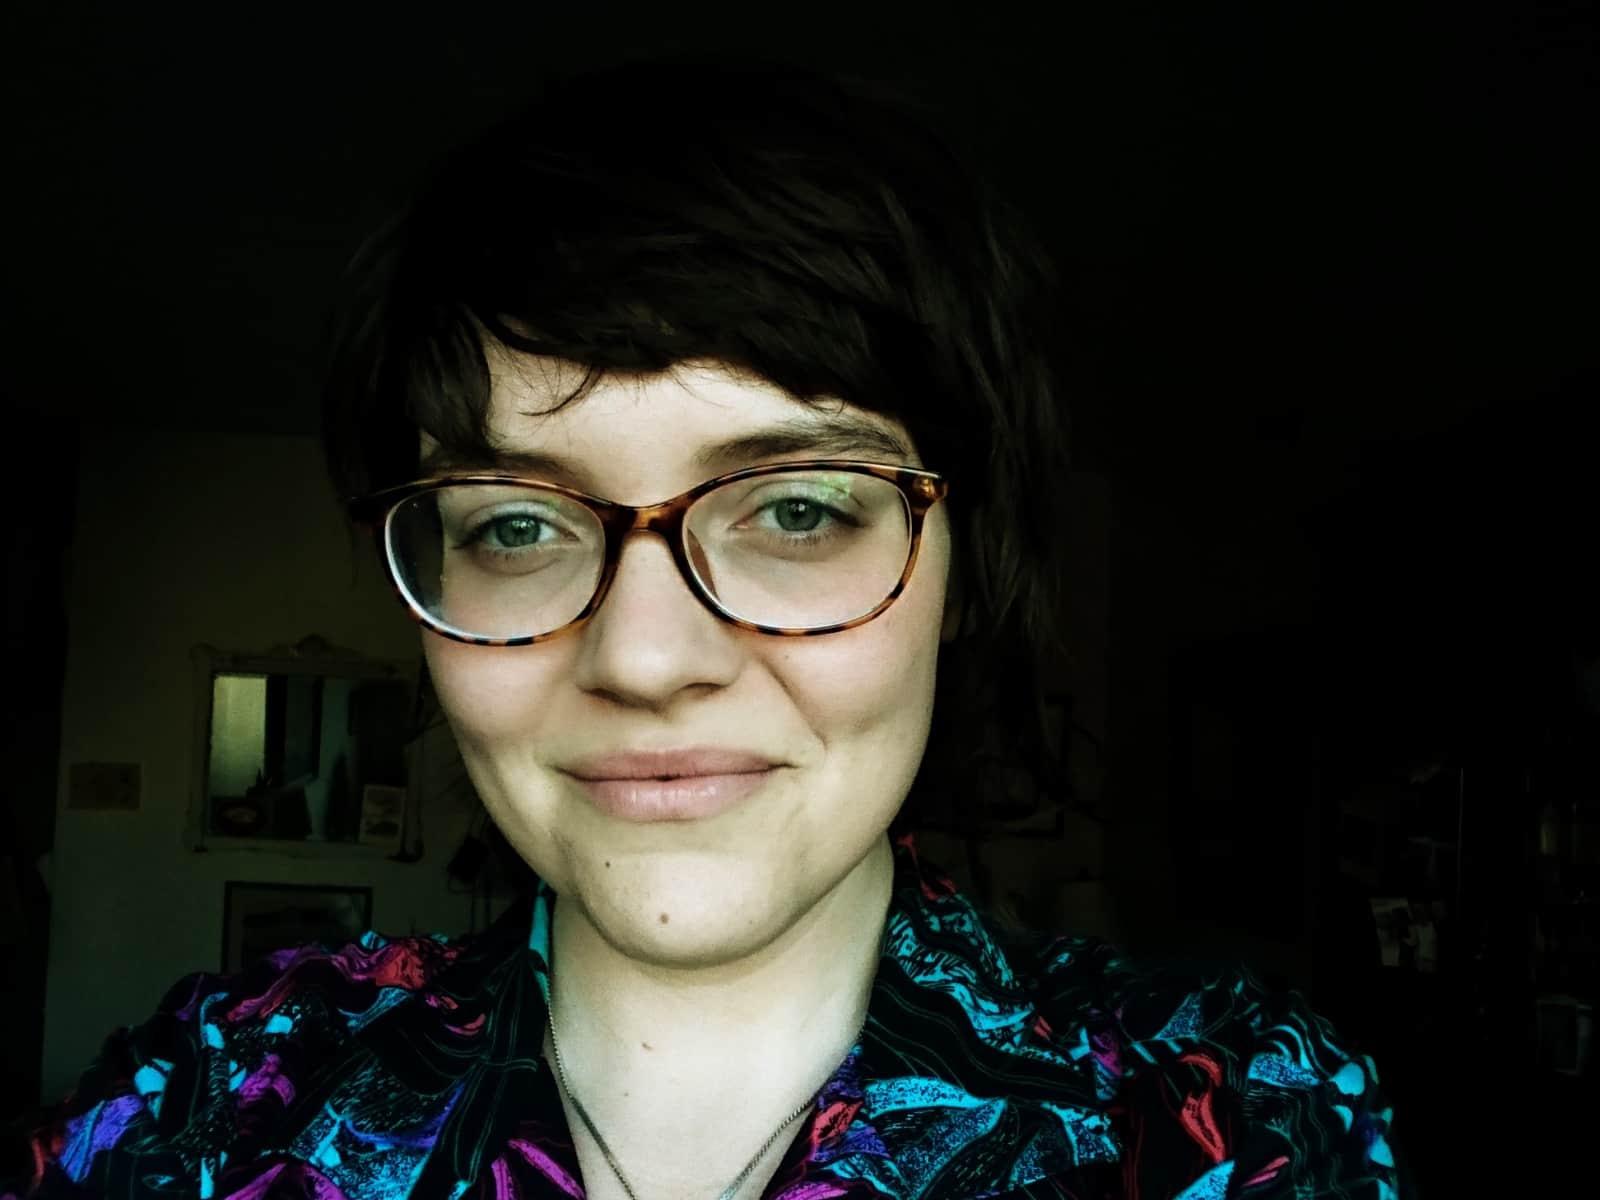 Amy from Halifax, Nova Scotia, Canada